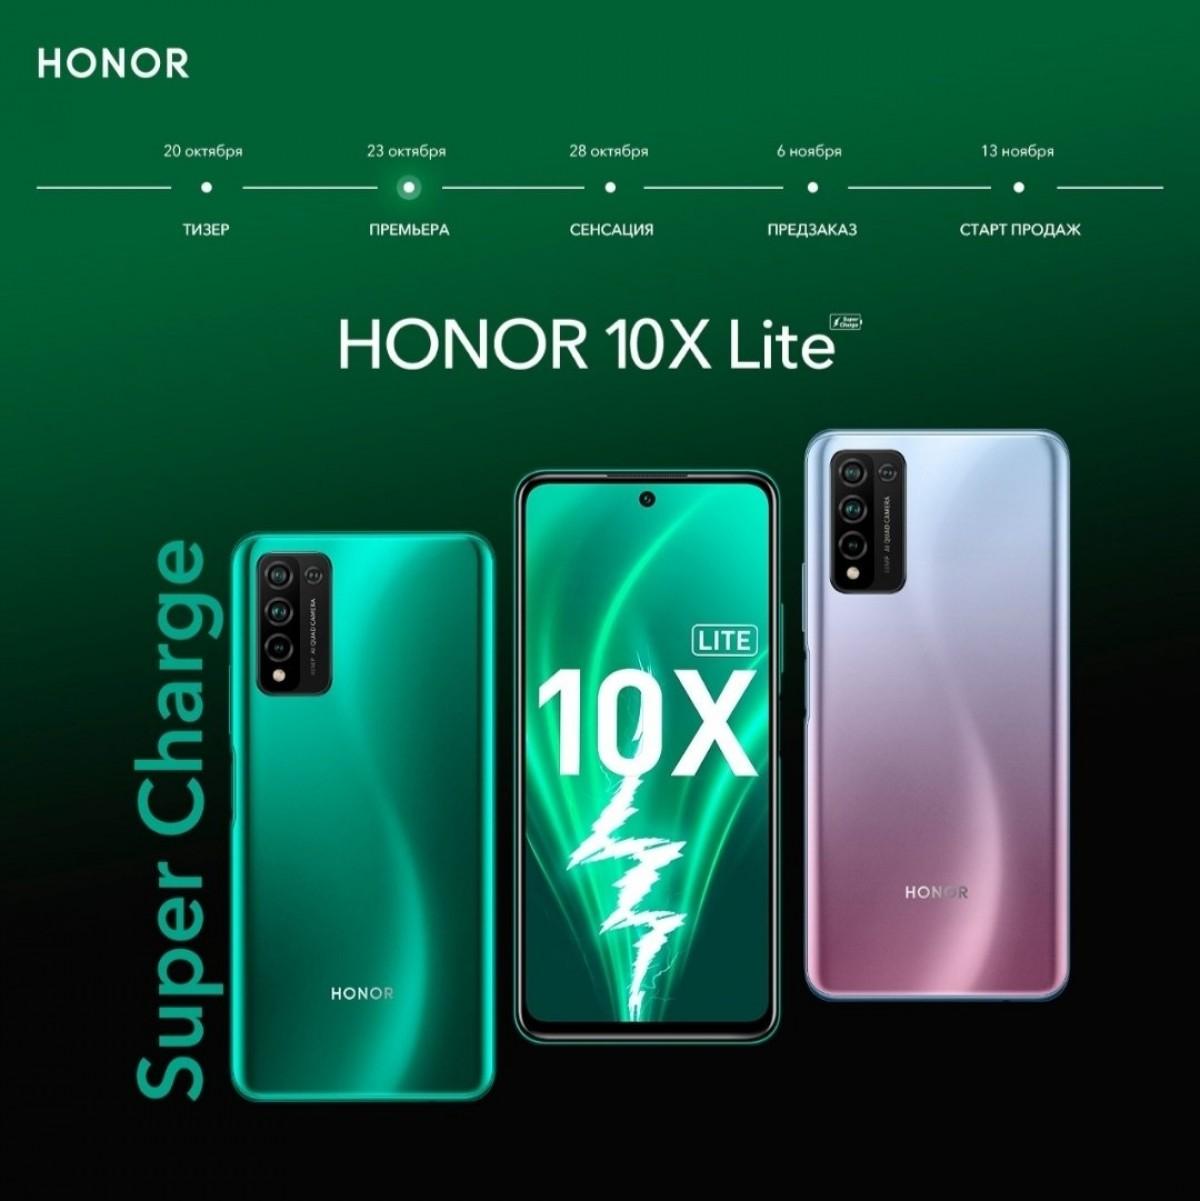 Wyciek³o info na temat Honor 10X Lite